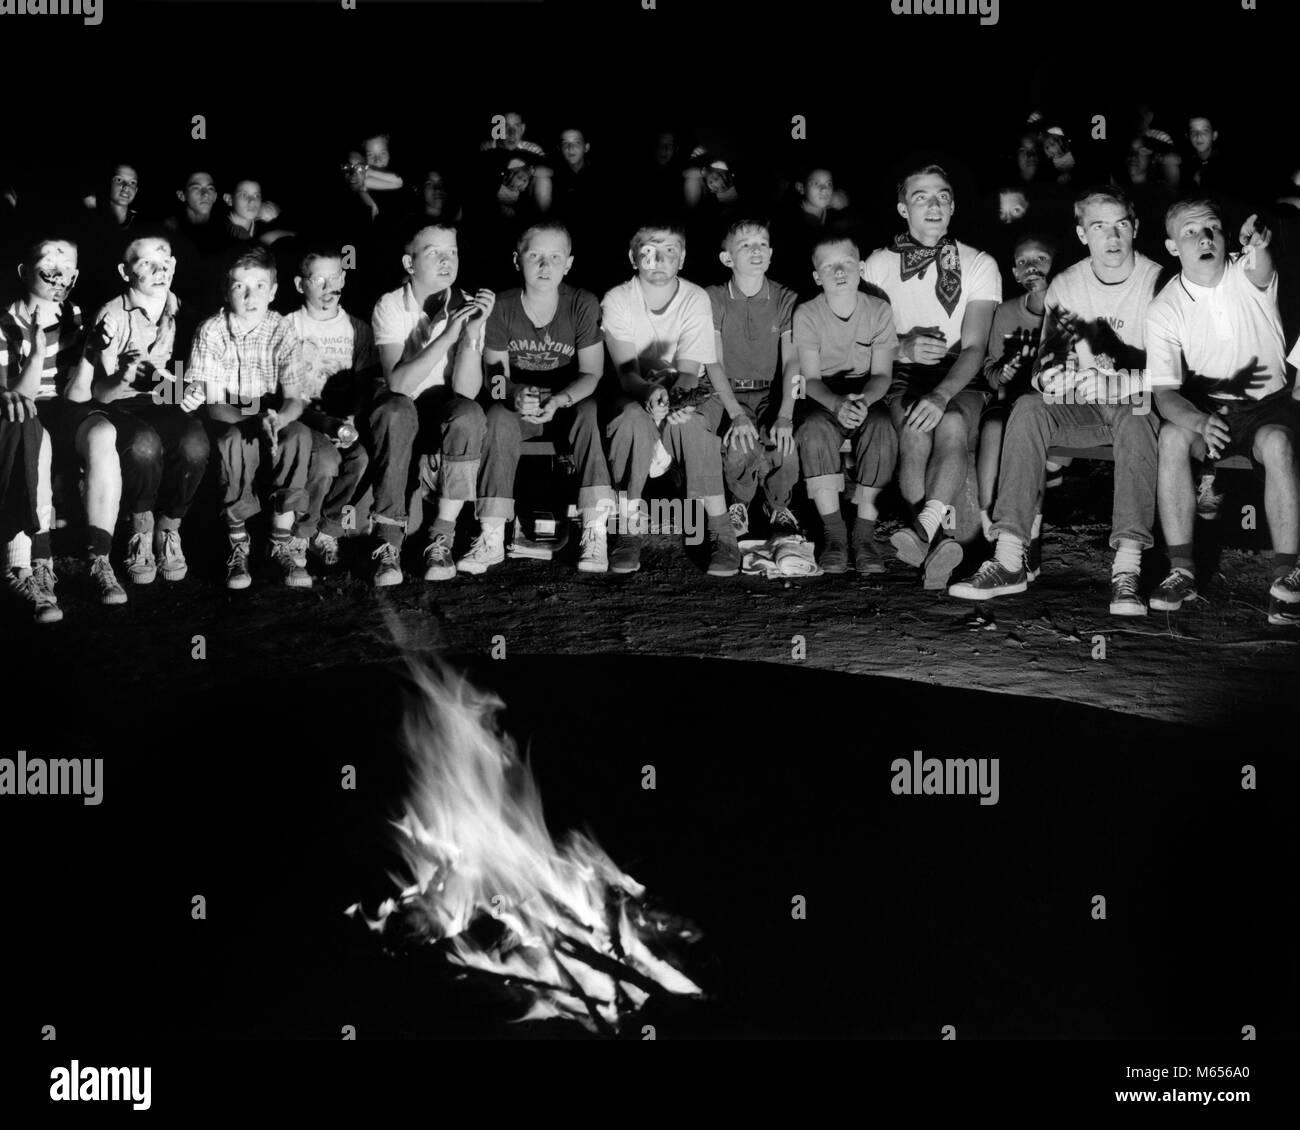 1960s GROUP PRE-TEEN BOYS SITTING AROUND NIGHT CAMPFIRE AT SUMMER CAMP - c9412 HAR001 HARS INSPIRATION AWAY TEENAGE Stock Photo